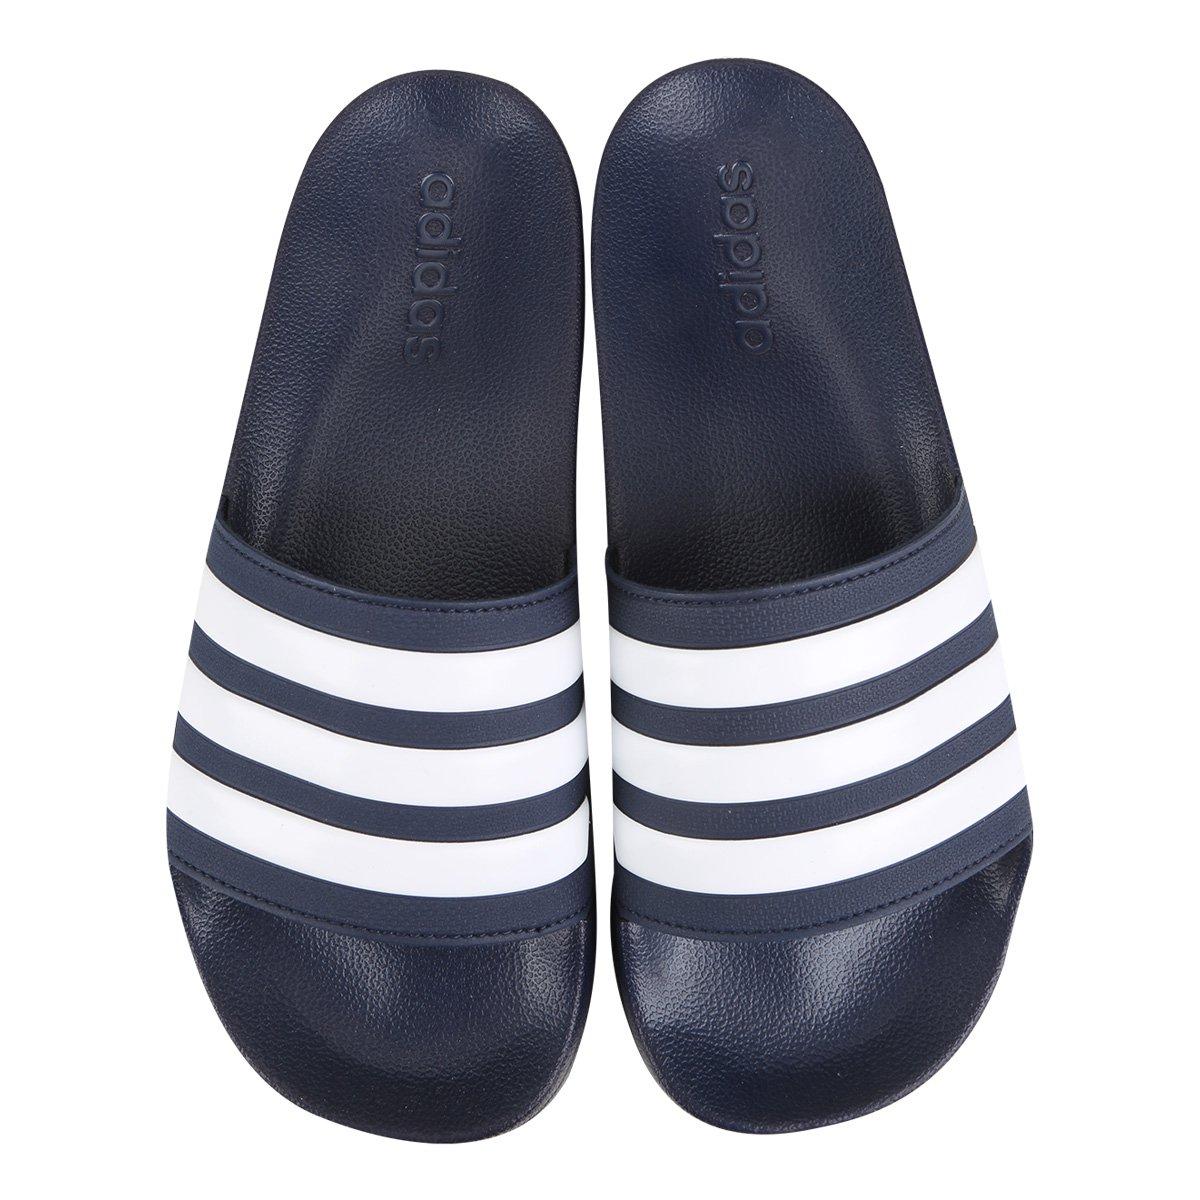 buy online b288b 373ff Chinelo Slide Adidas Adilette Cloudfoam Masculino - Marinho e Branco -  Compre Agora   São Paulo Mania